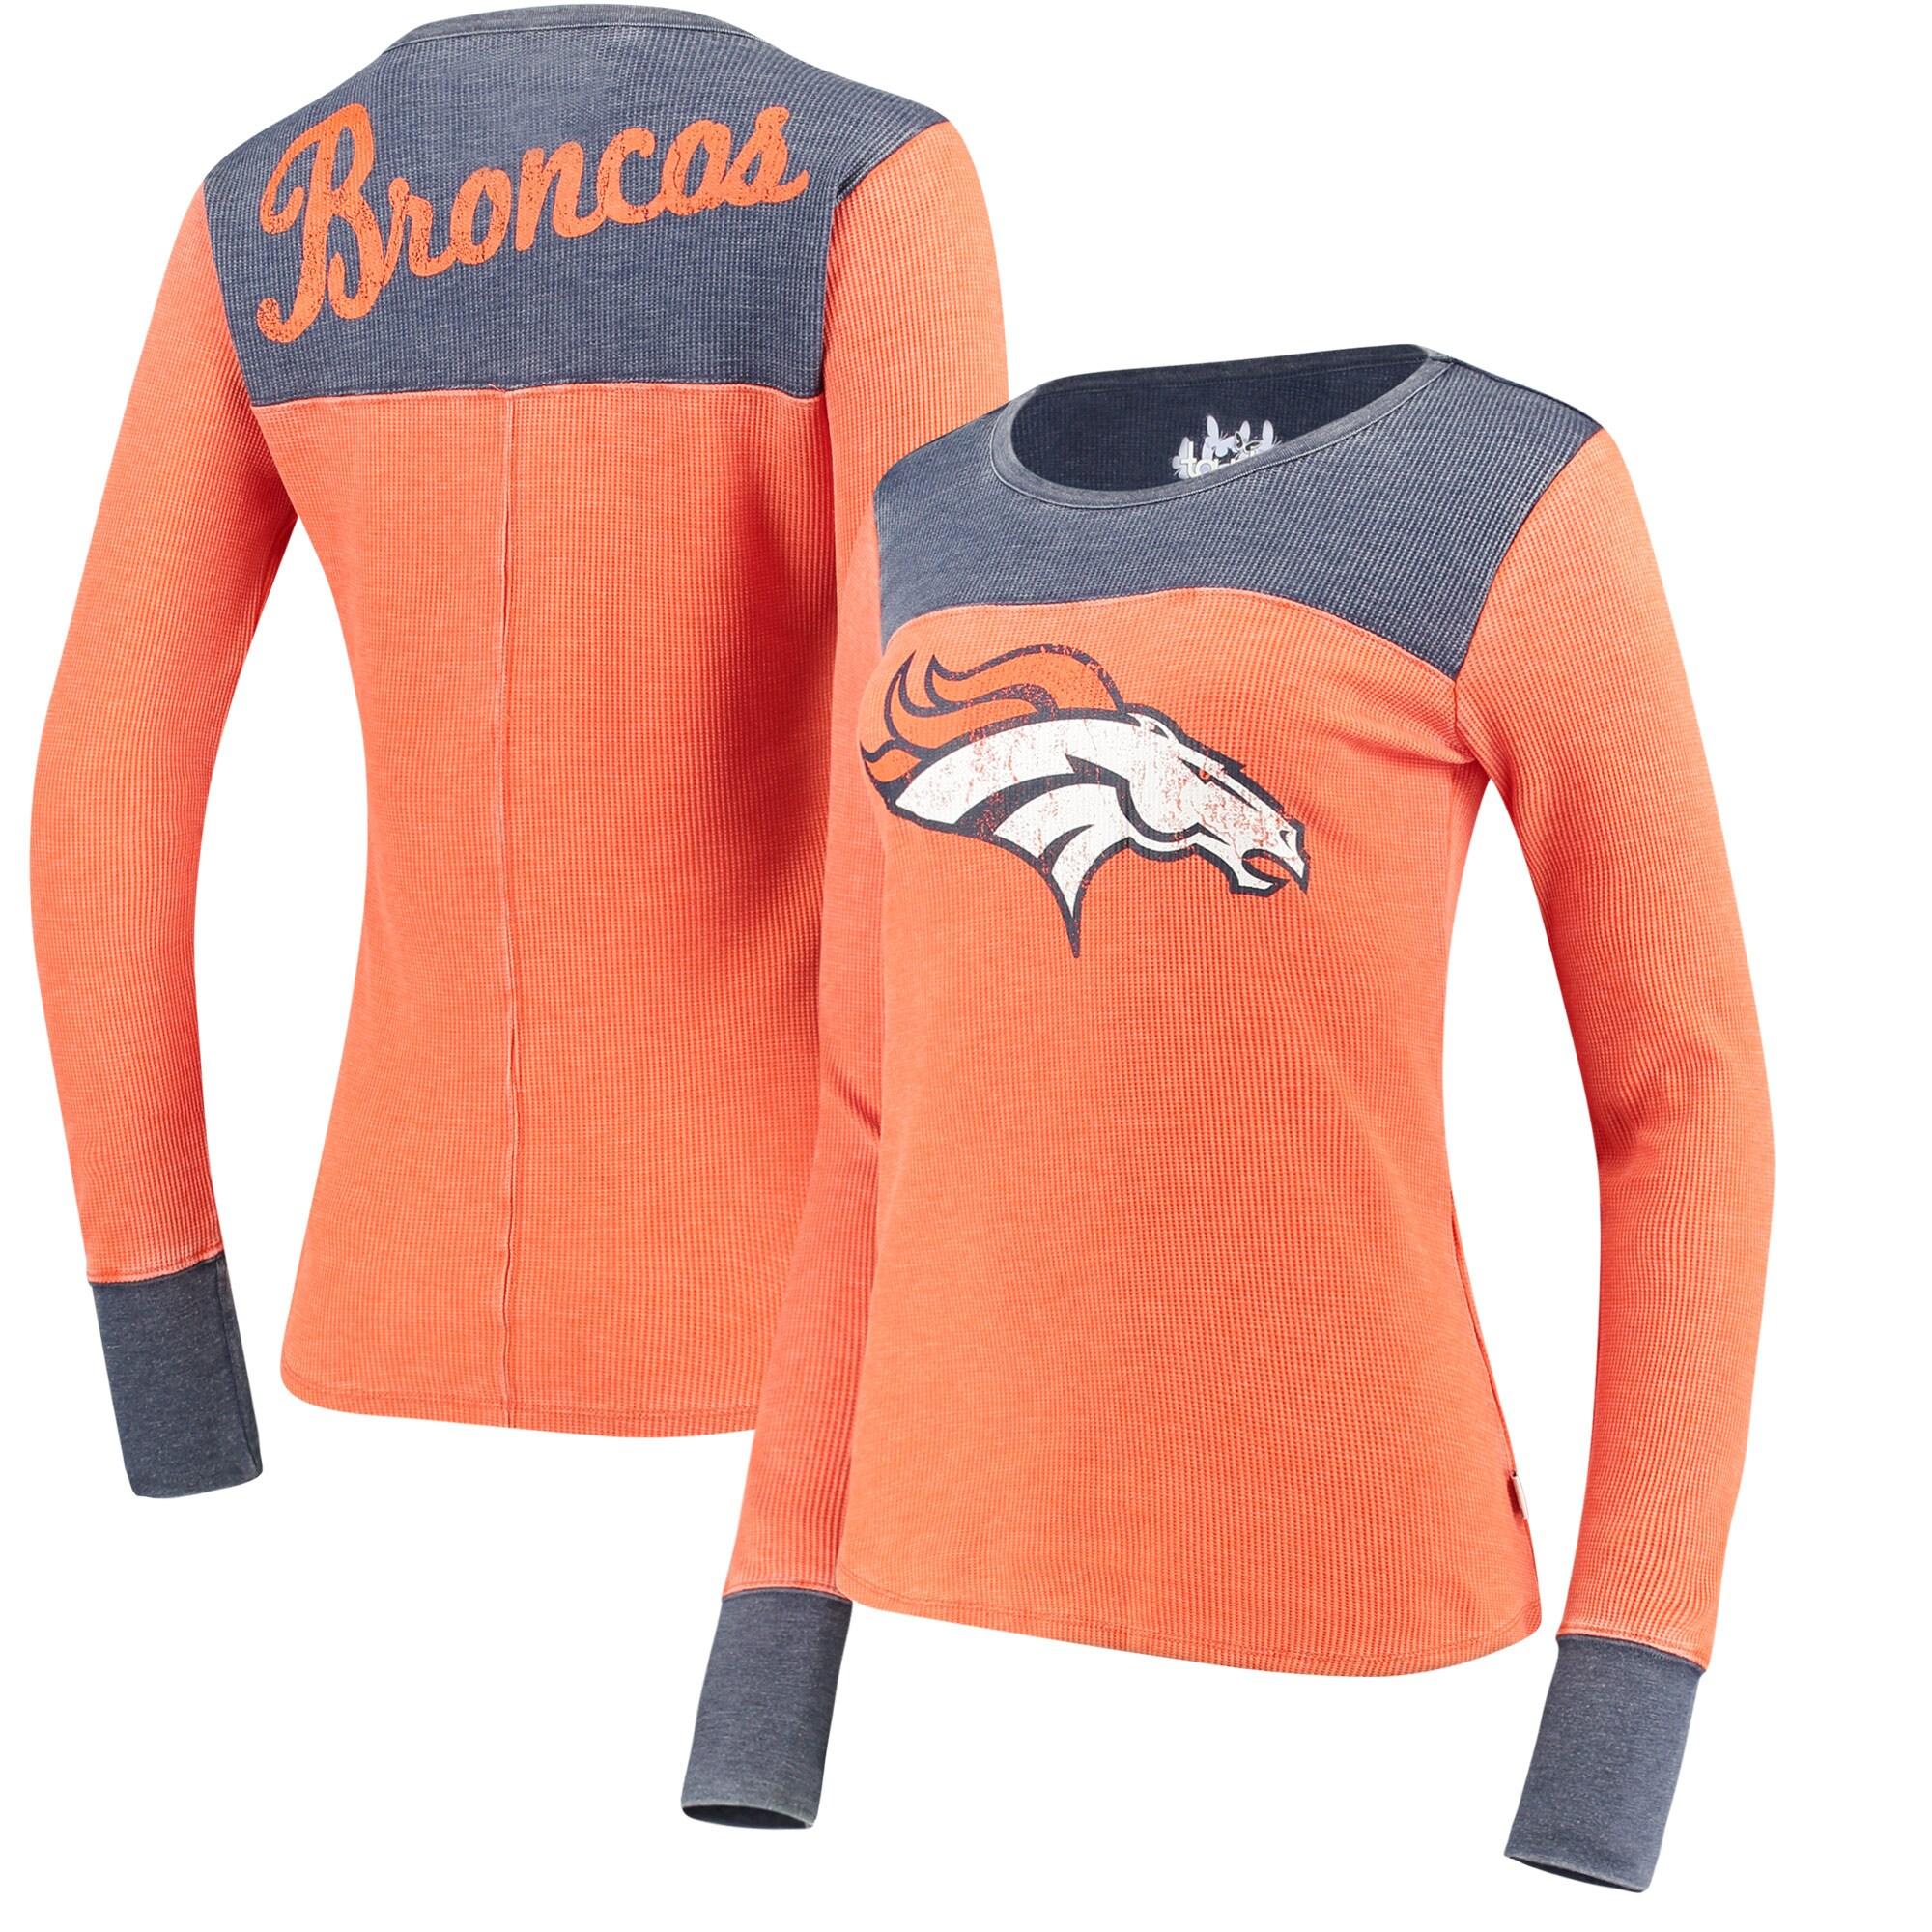 Denver Broncos Touch by Alyssa Milano Women's Blindside Long Sleeve Tri-Blend Thermal T-Shirt - Orange/Navy